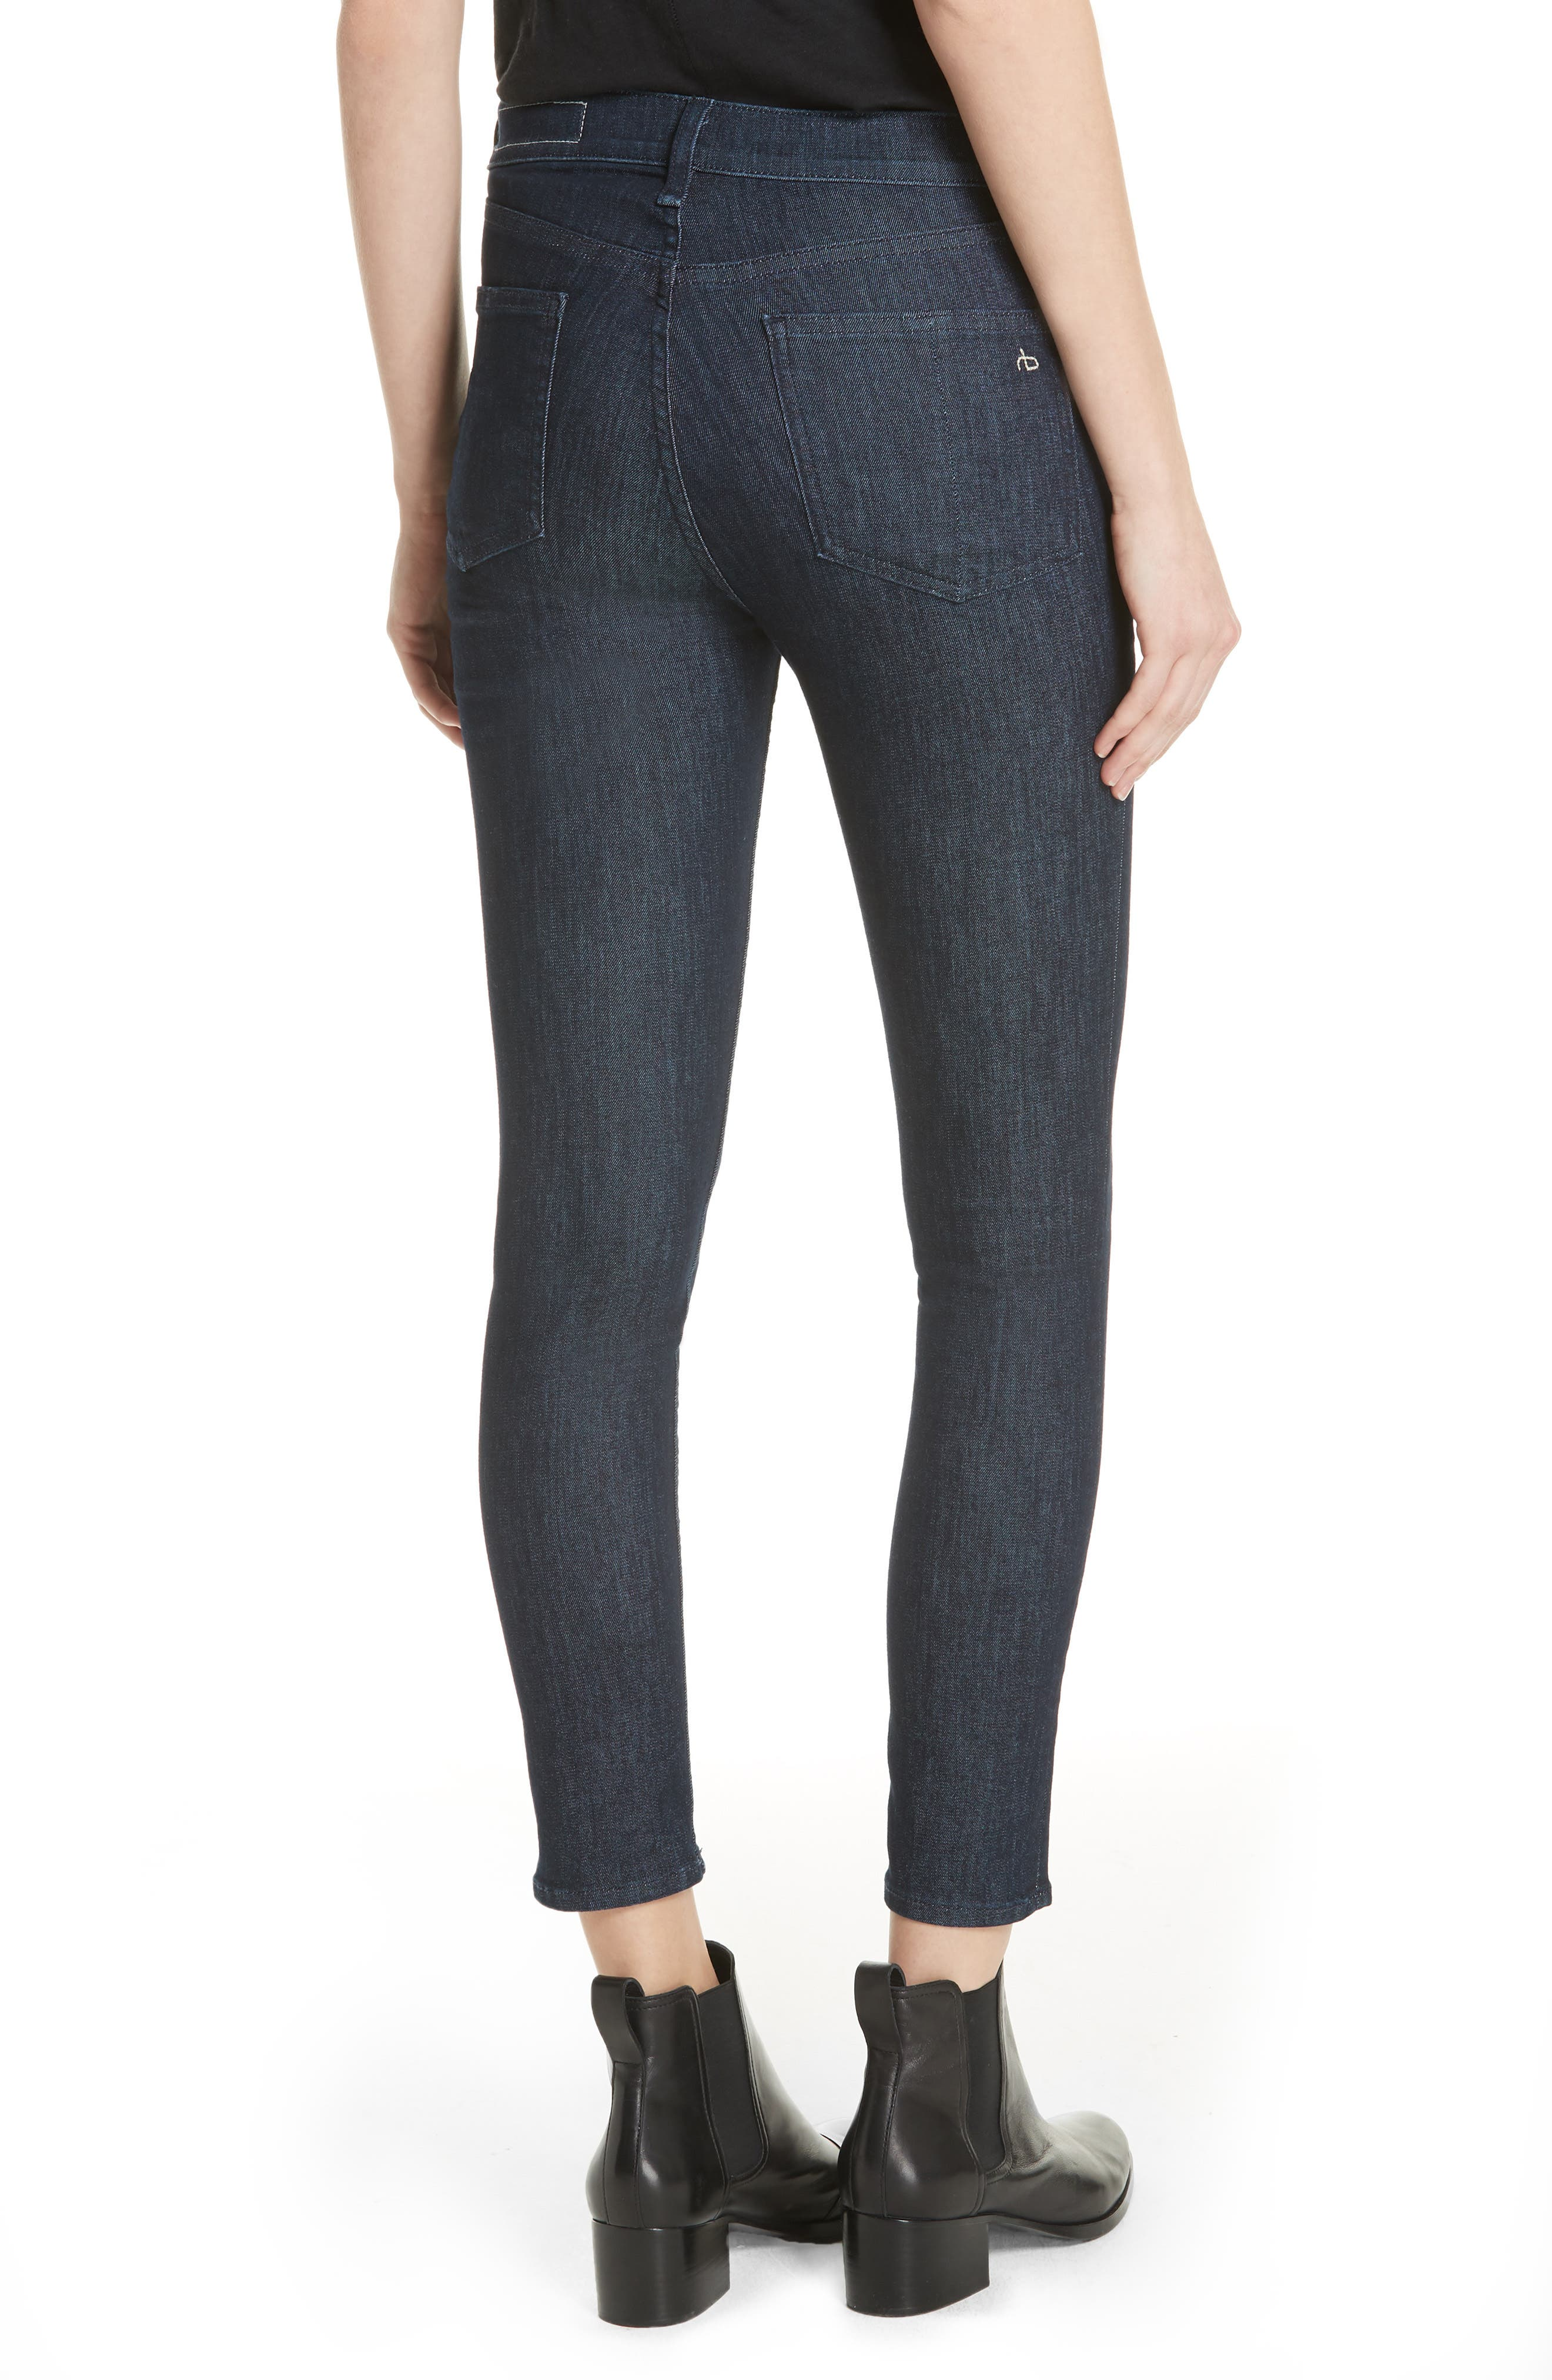 RAG & BONE, High Waist Skinny Jeans, Alternate thumbnail 2, color, INDIGO